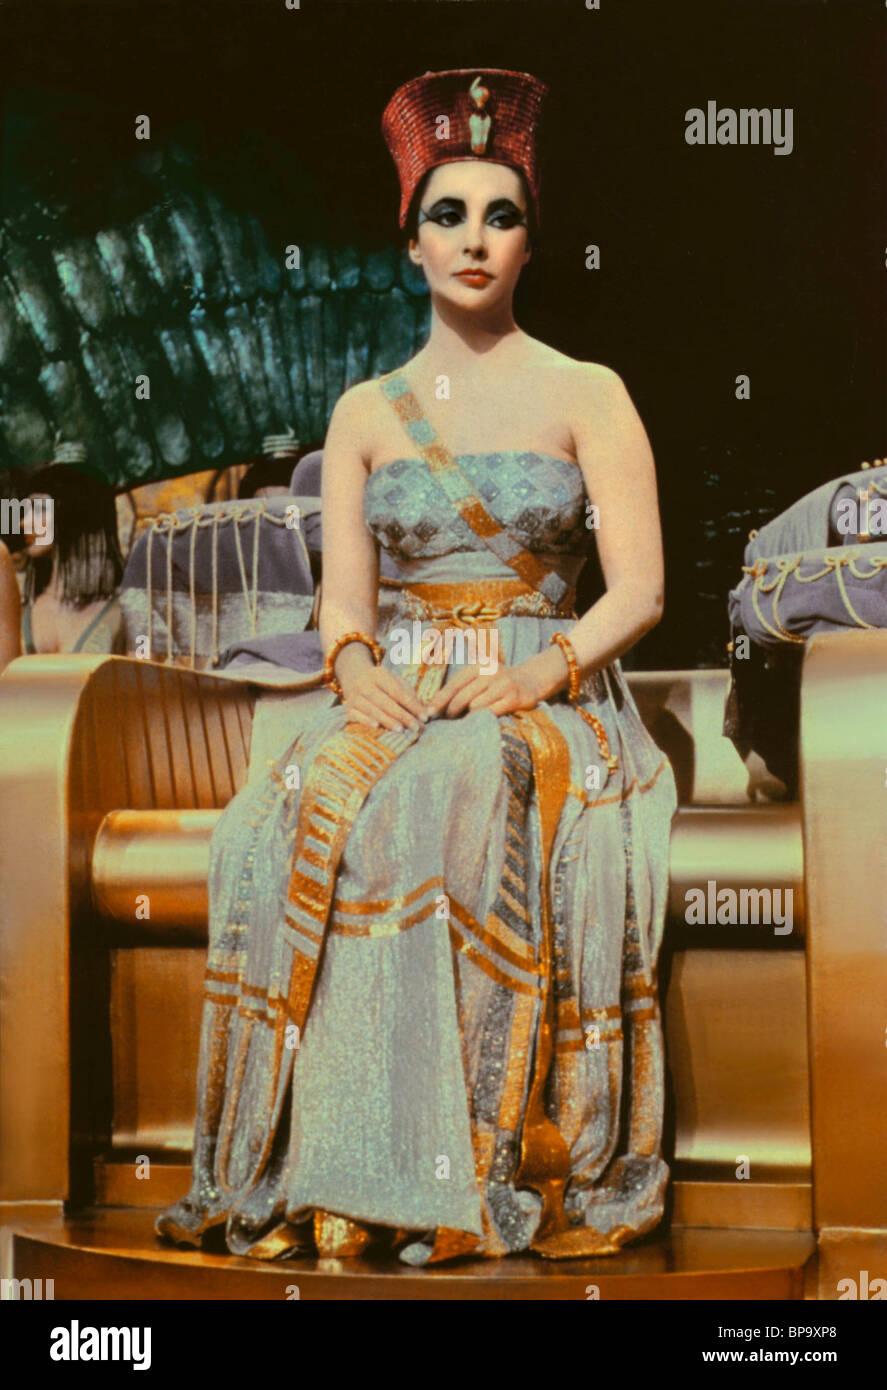 Elizabeth Taylor On Throne Cleopatra 1963 Stock Photo